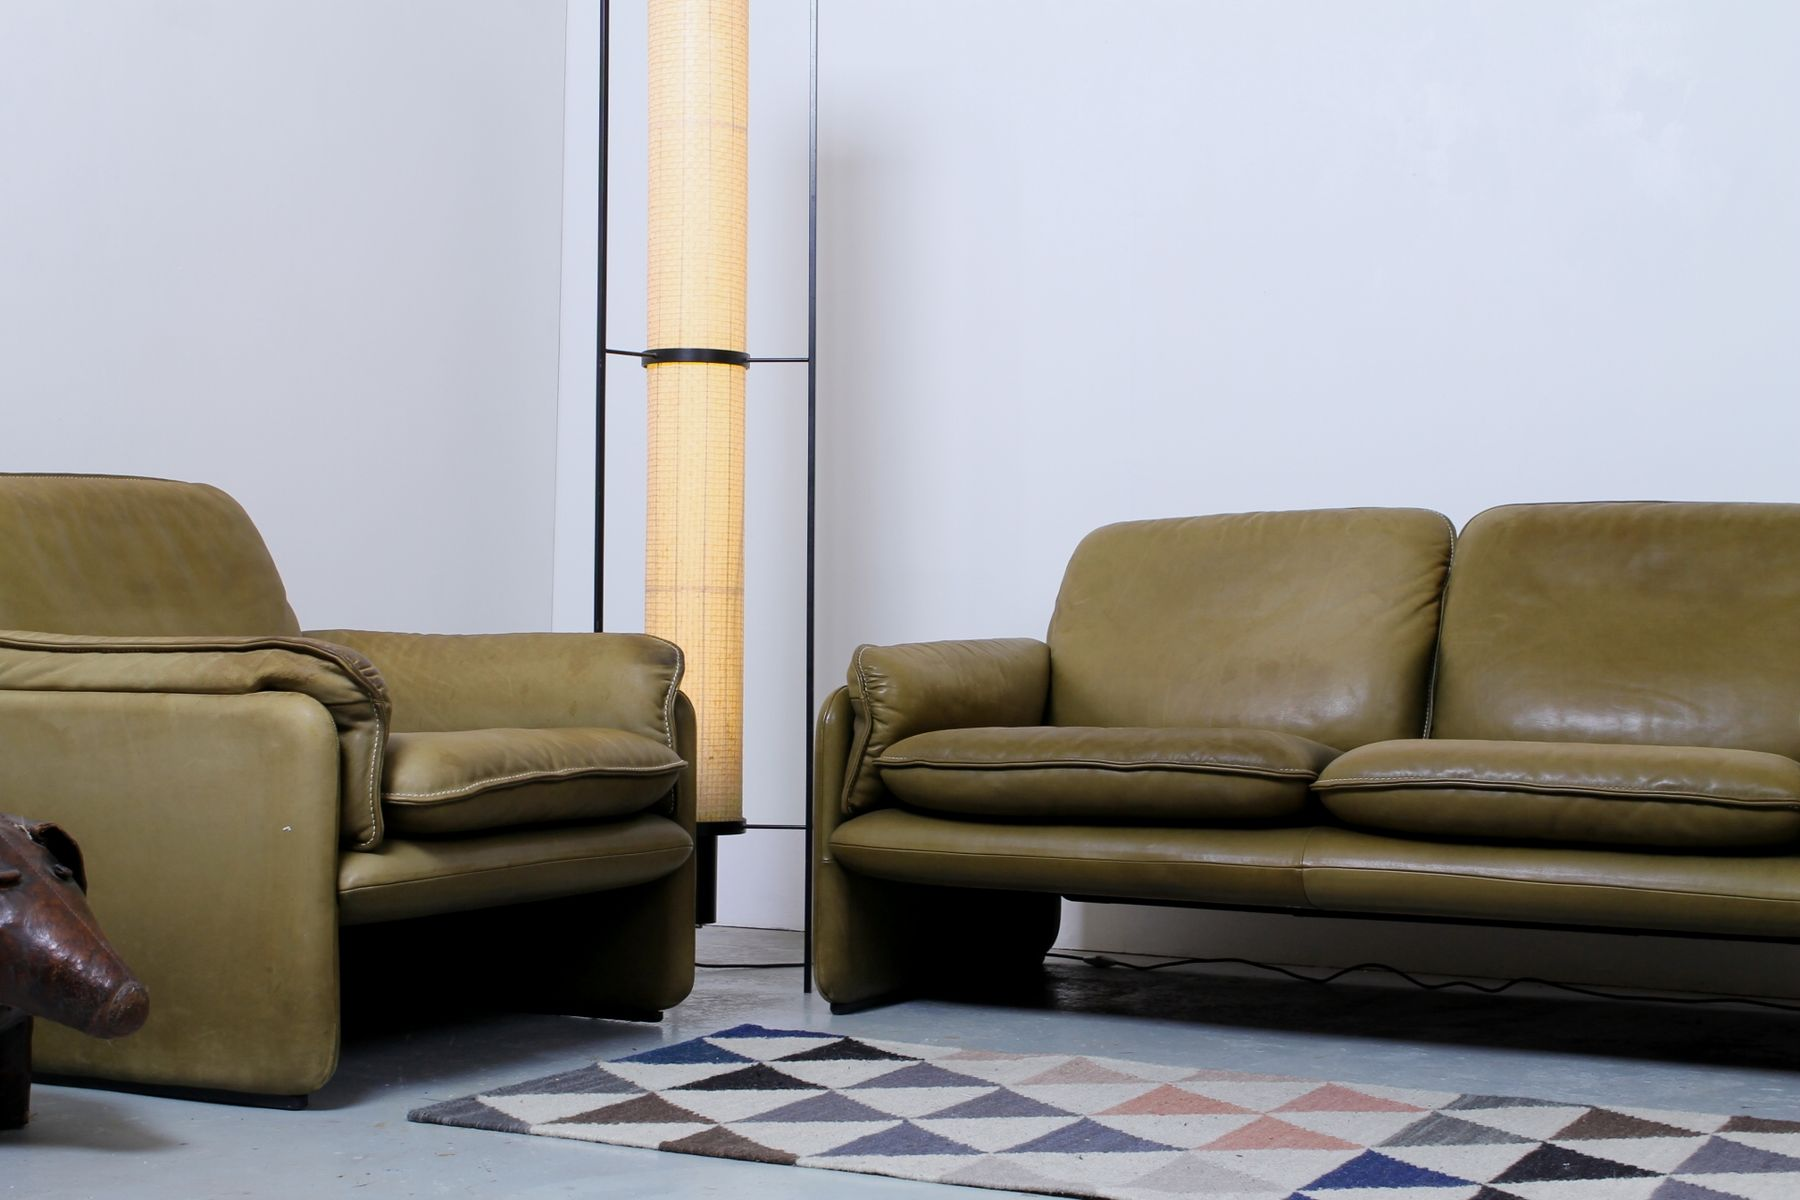 vintage 2 sitzer sofa und ds 61 sessel von de sede bei. Black Bedroom Furniture Sets. Home Design Ideas